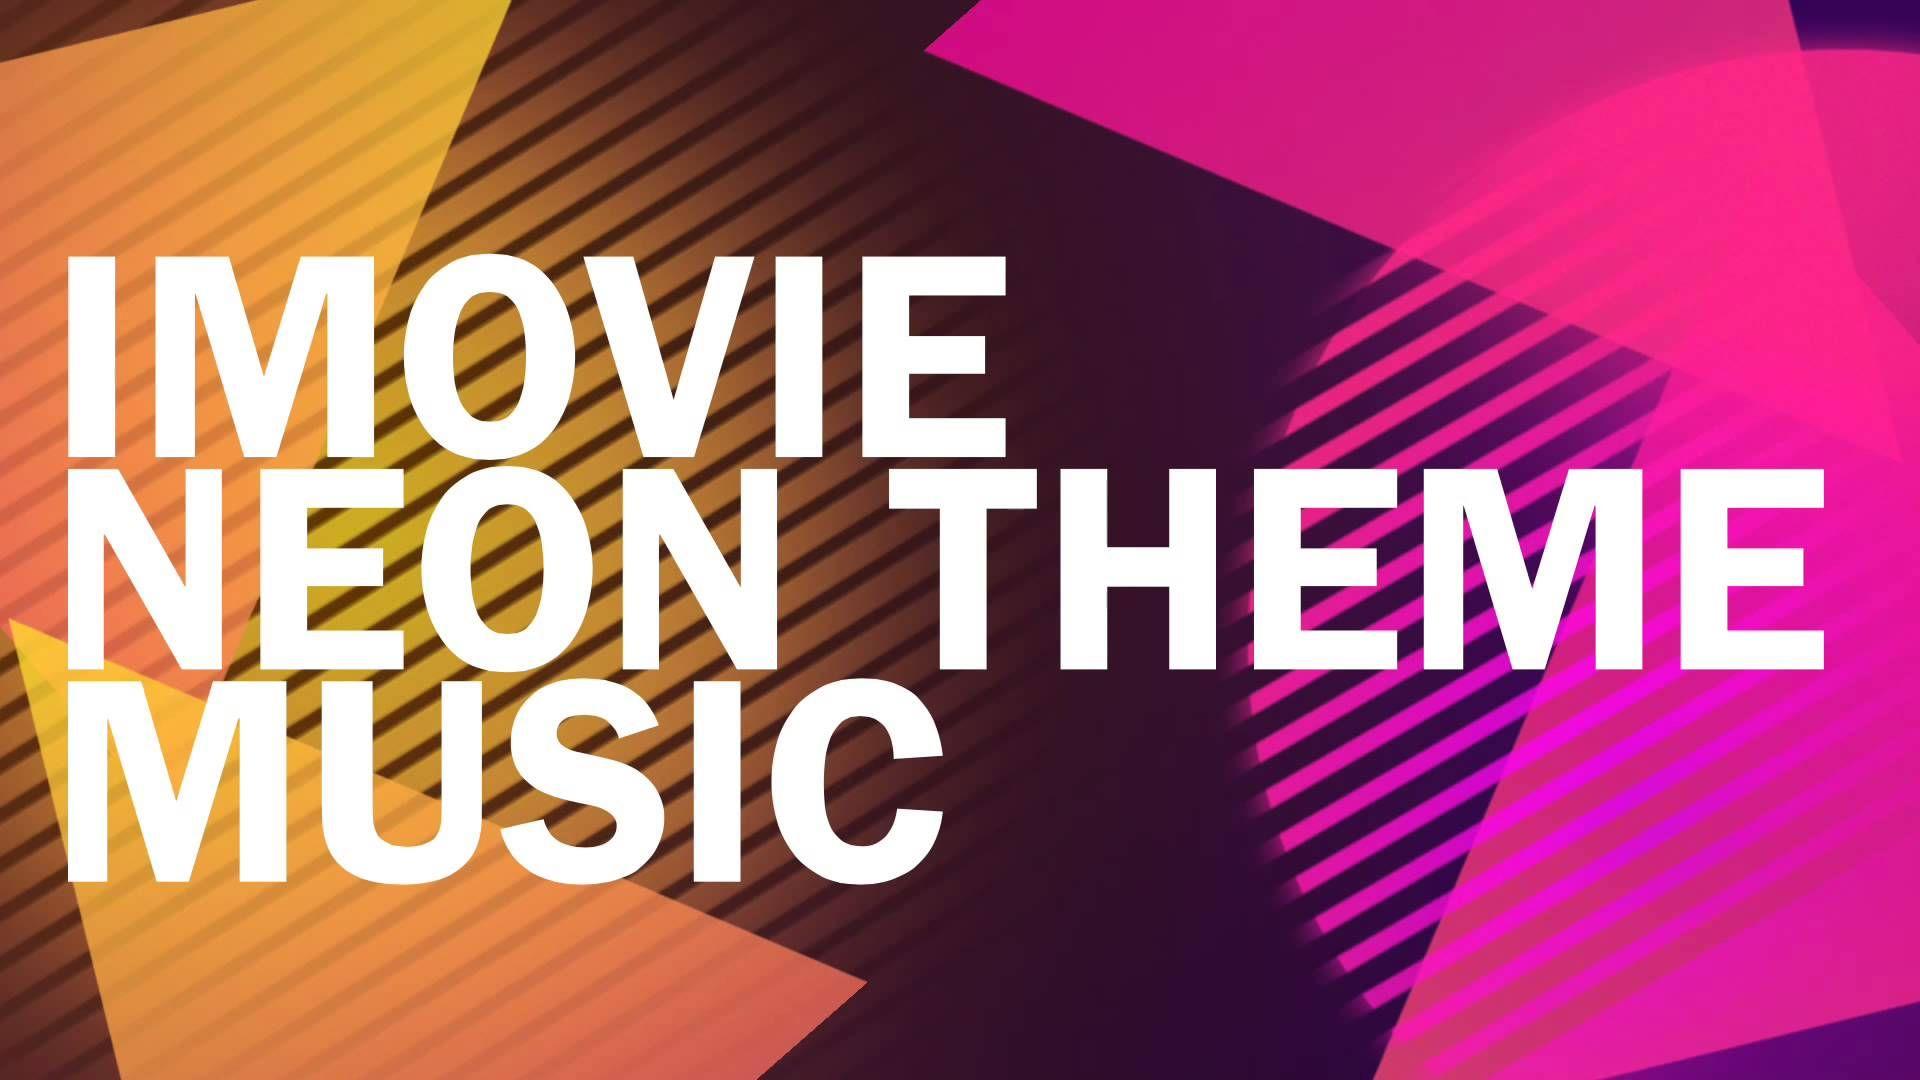 iMovie Neon theme music Dog clicker training, Dog